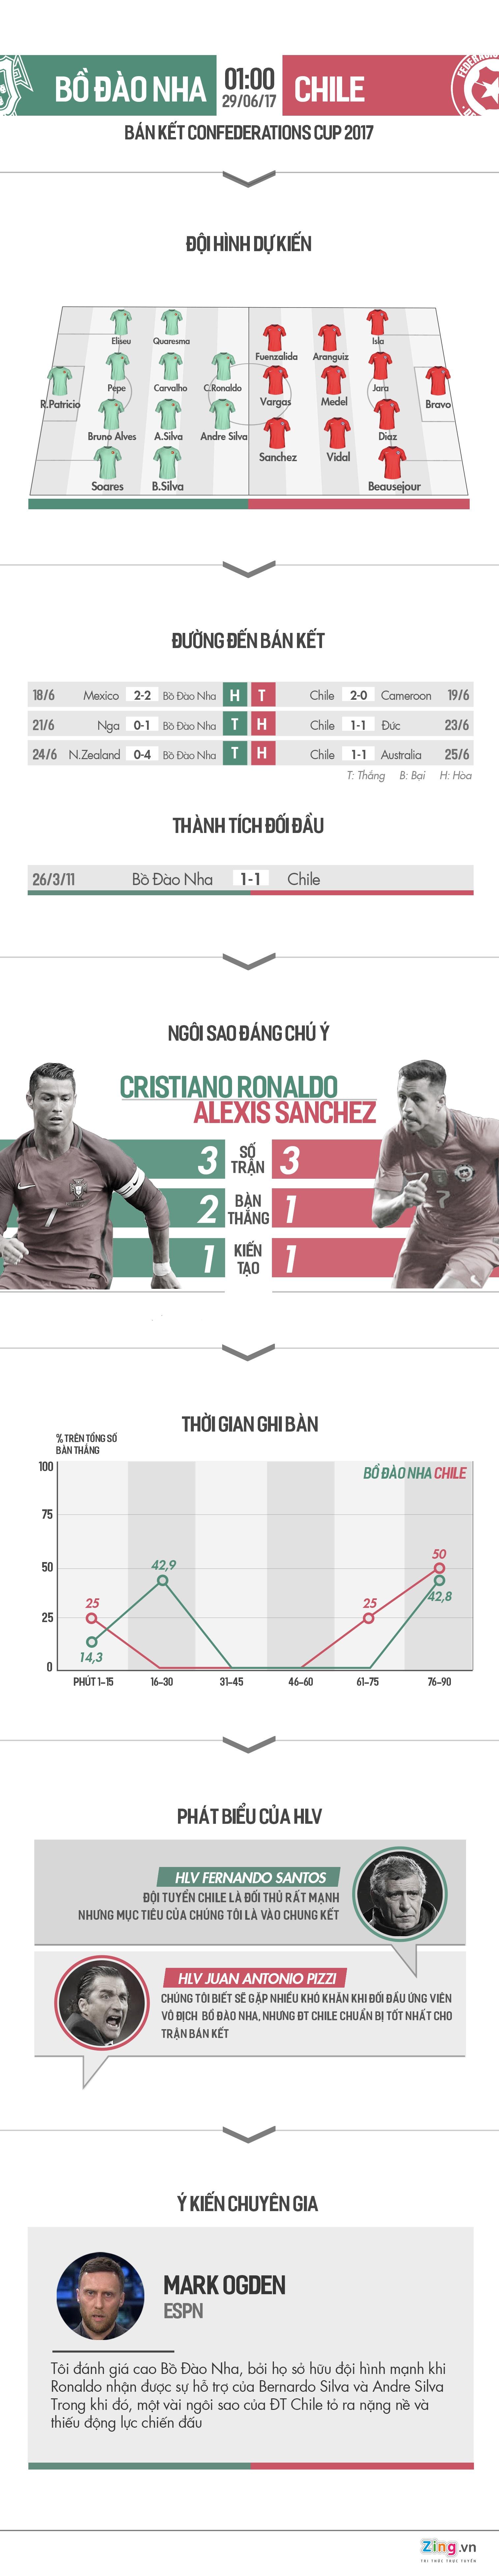 Bo Dao Nha vs Chile: Ronaldo so tai Sanchez, Vidal hinh anh 1